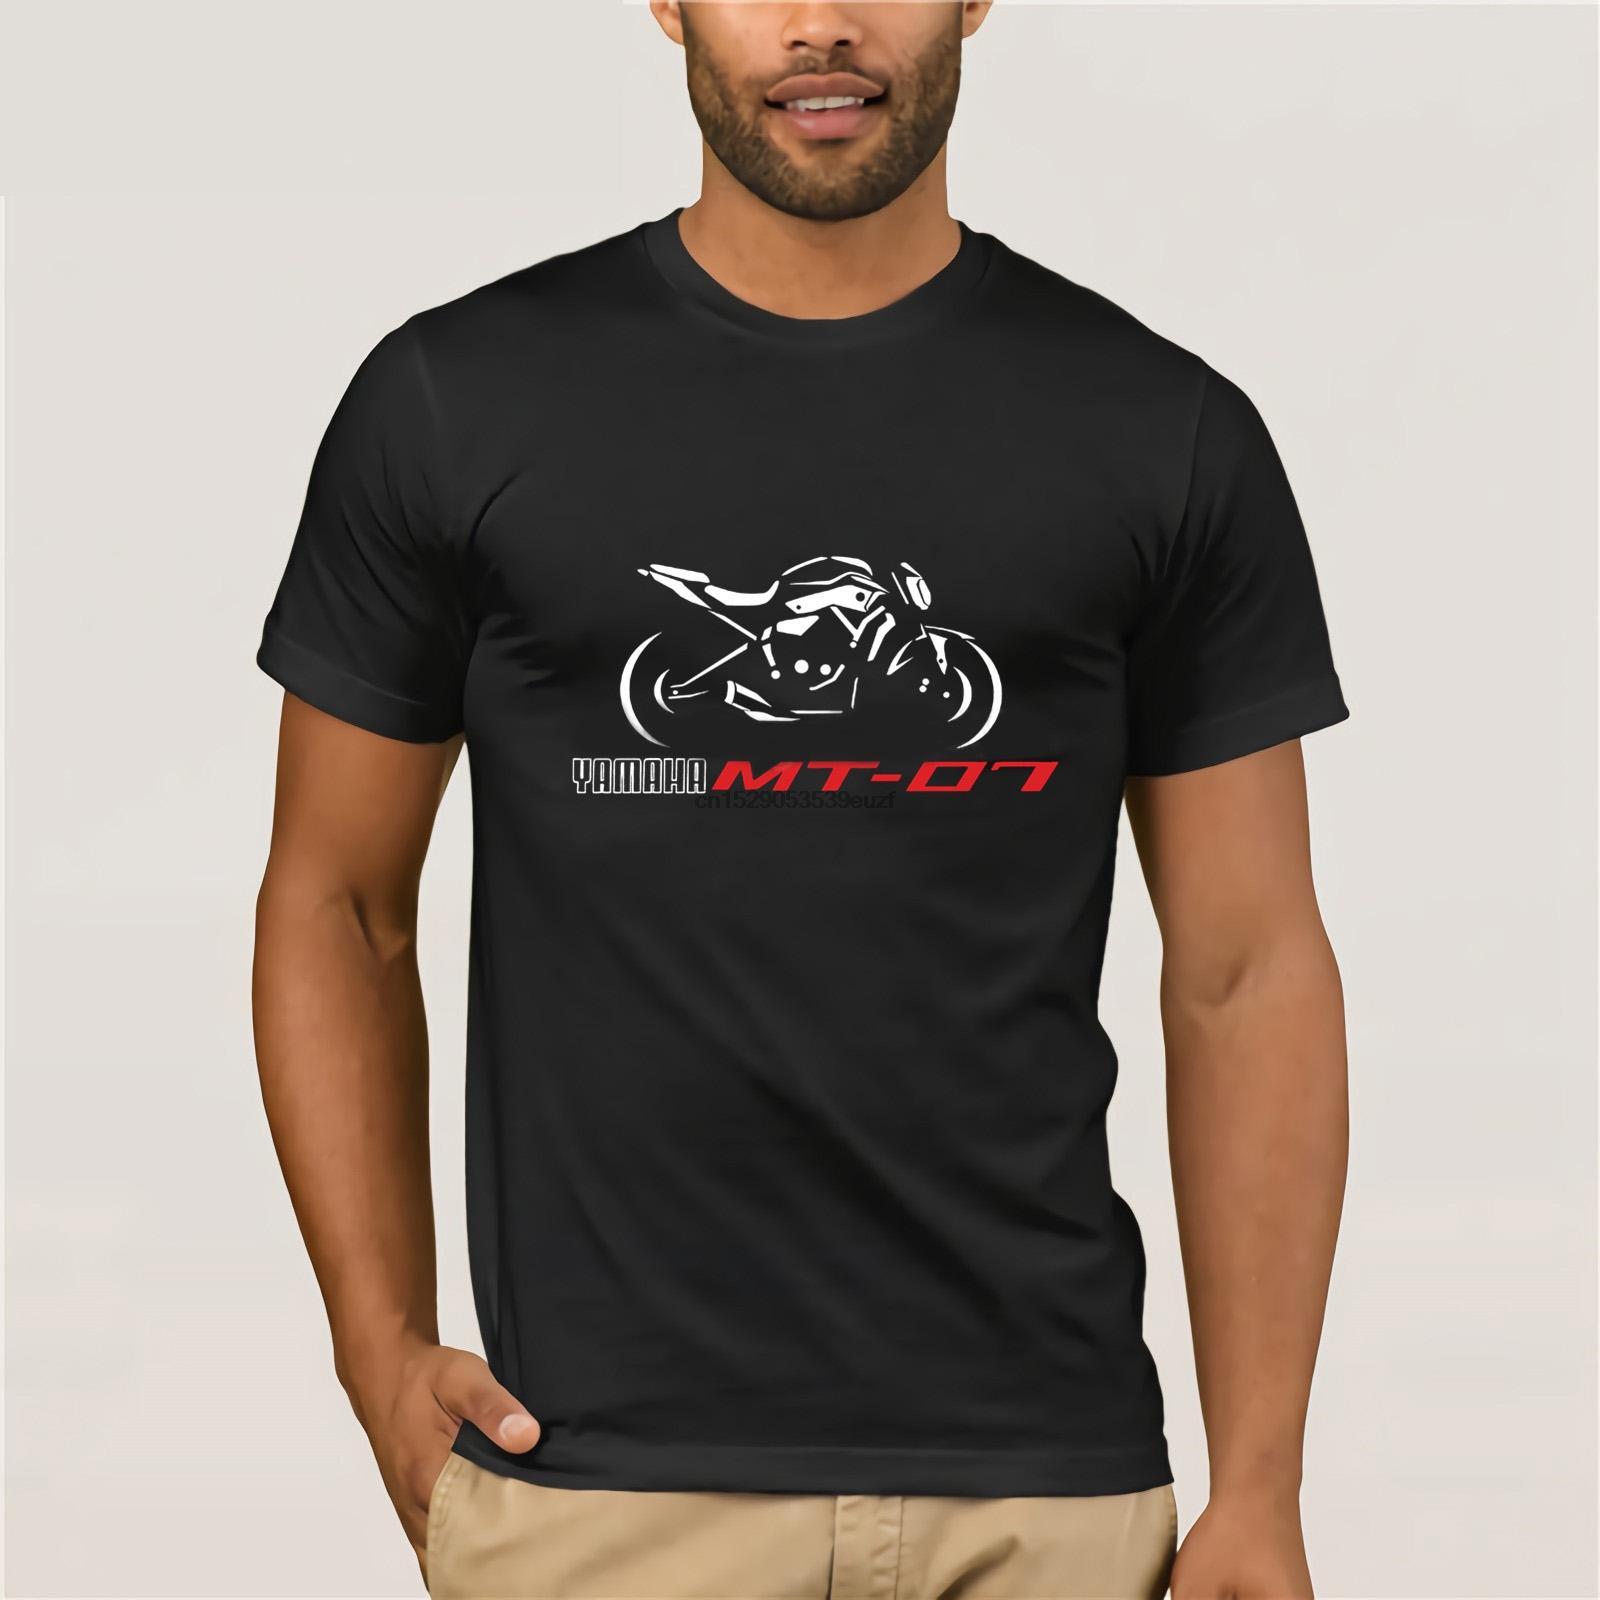 T-shirt T-shirt Casual Homens de Moda de Nova para motocicletas Mt 07 Camiseta T-shirt Mt07